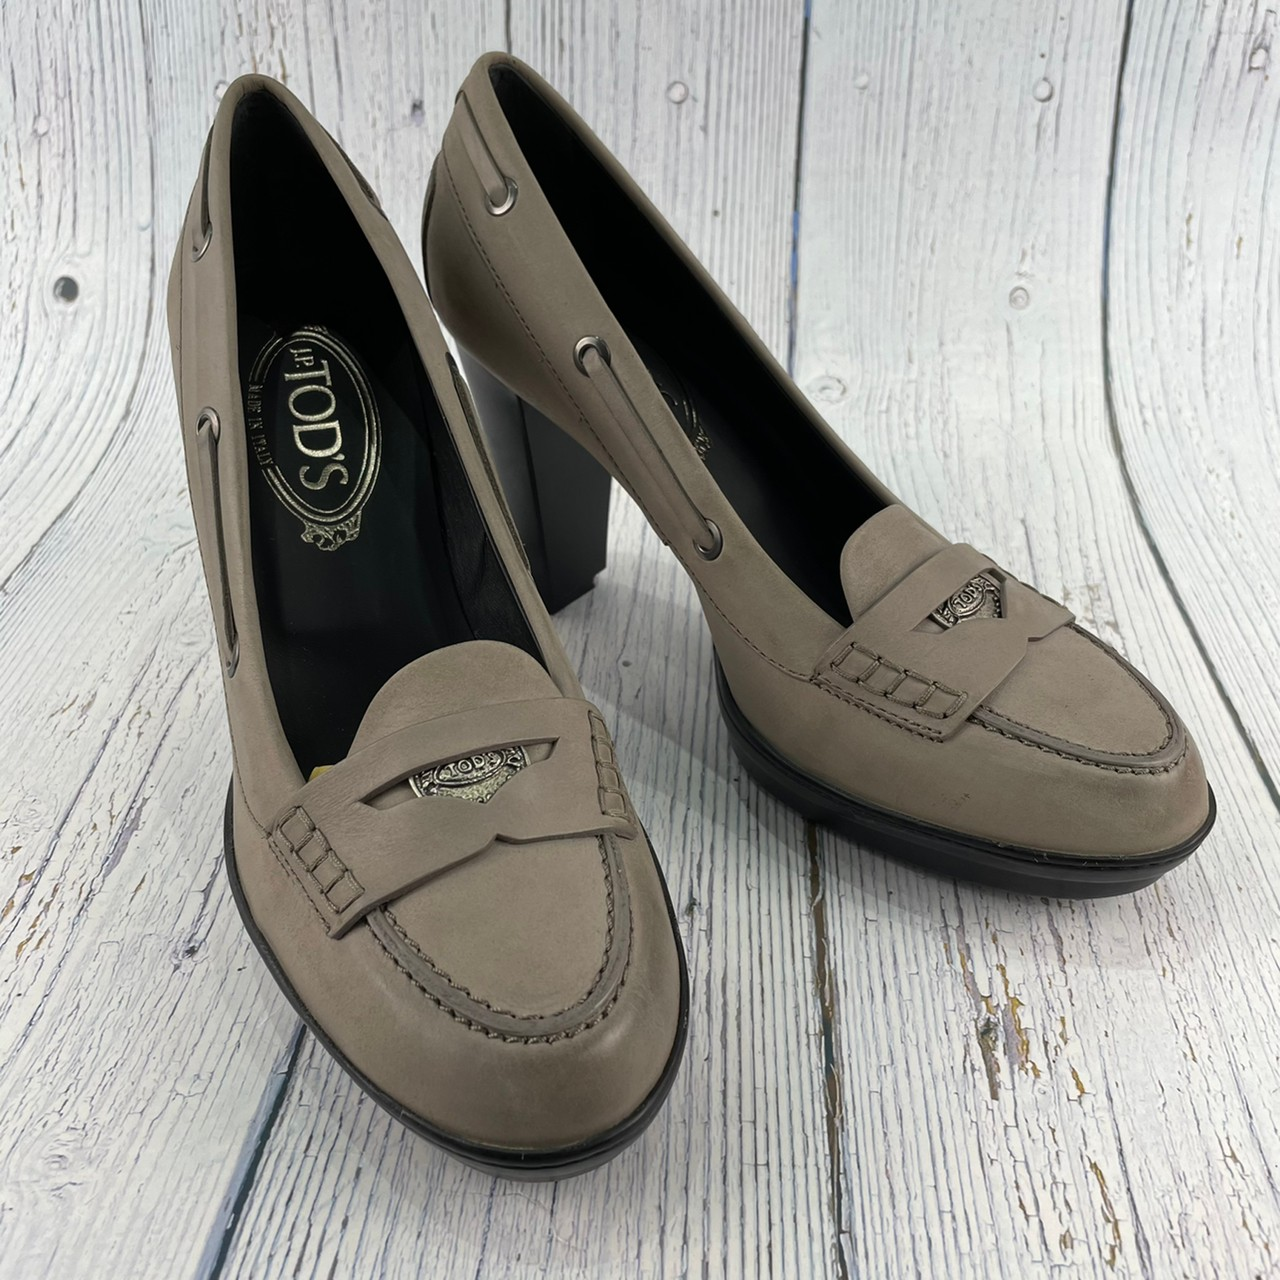 BRAND楓月 TOD'S 淺咖啡色 高跟鞋 樂福鞋 經典LOGO 皮革 厚底 女鞋 #38.5